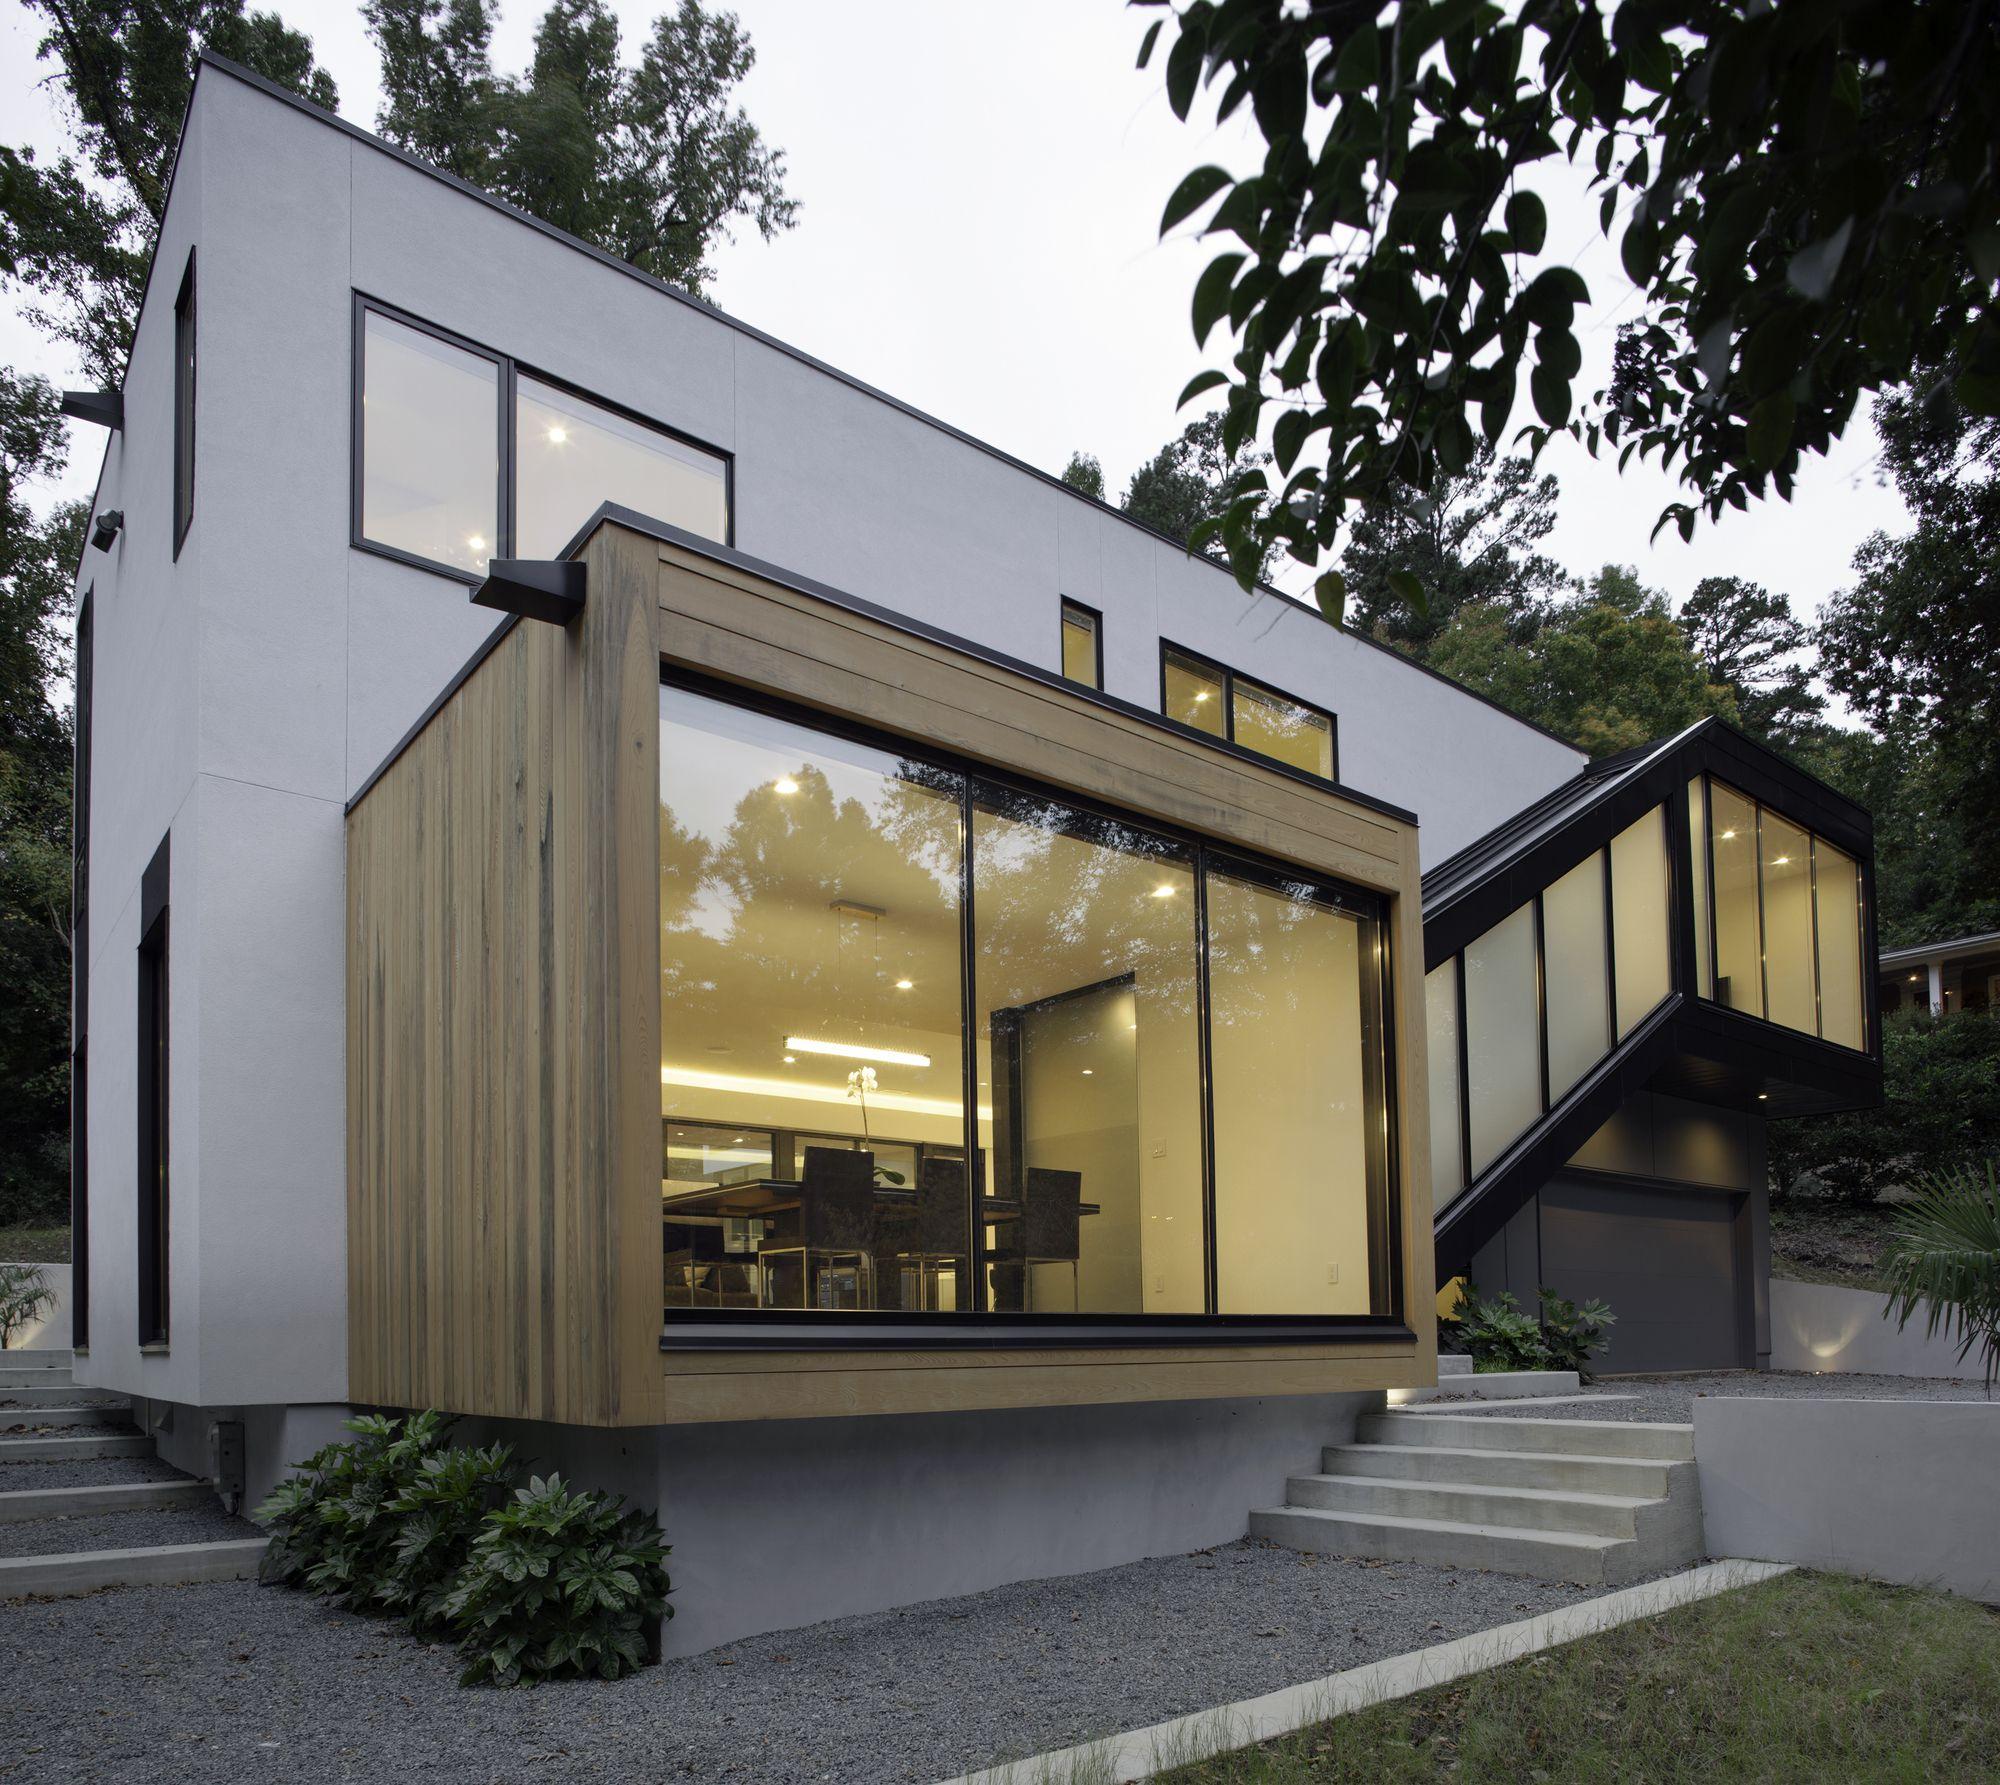 Galeria De Casas Exteriores: Residencia Medlin / In Situ Studio